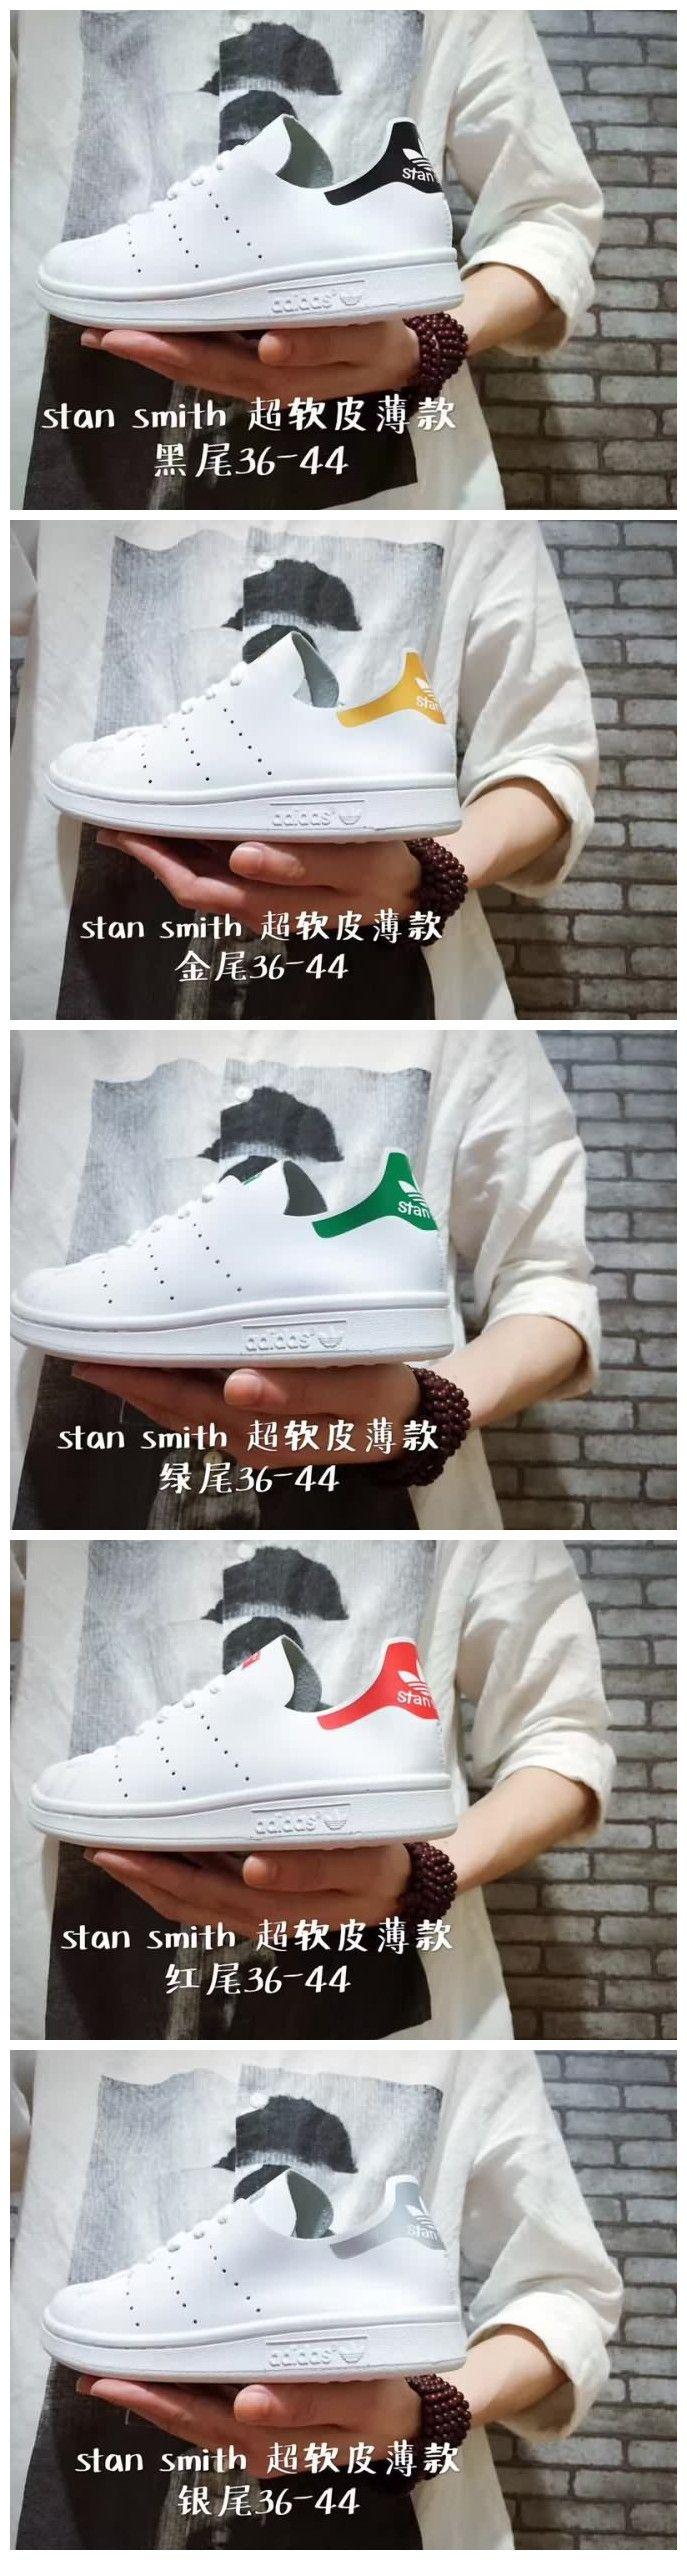 stan smith 44